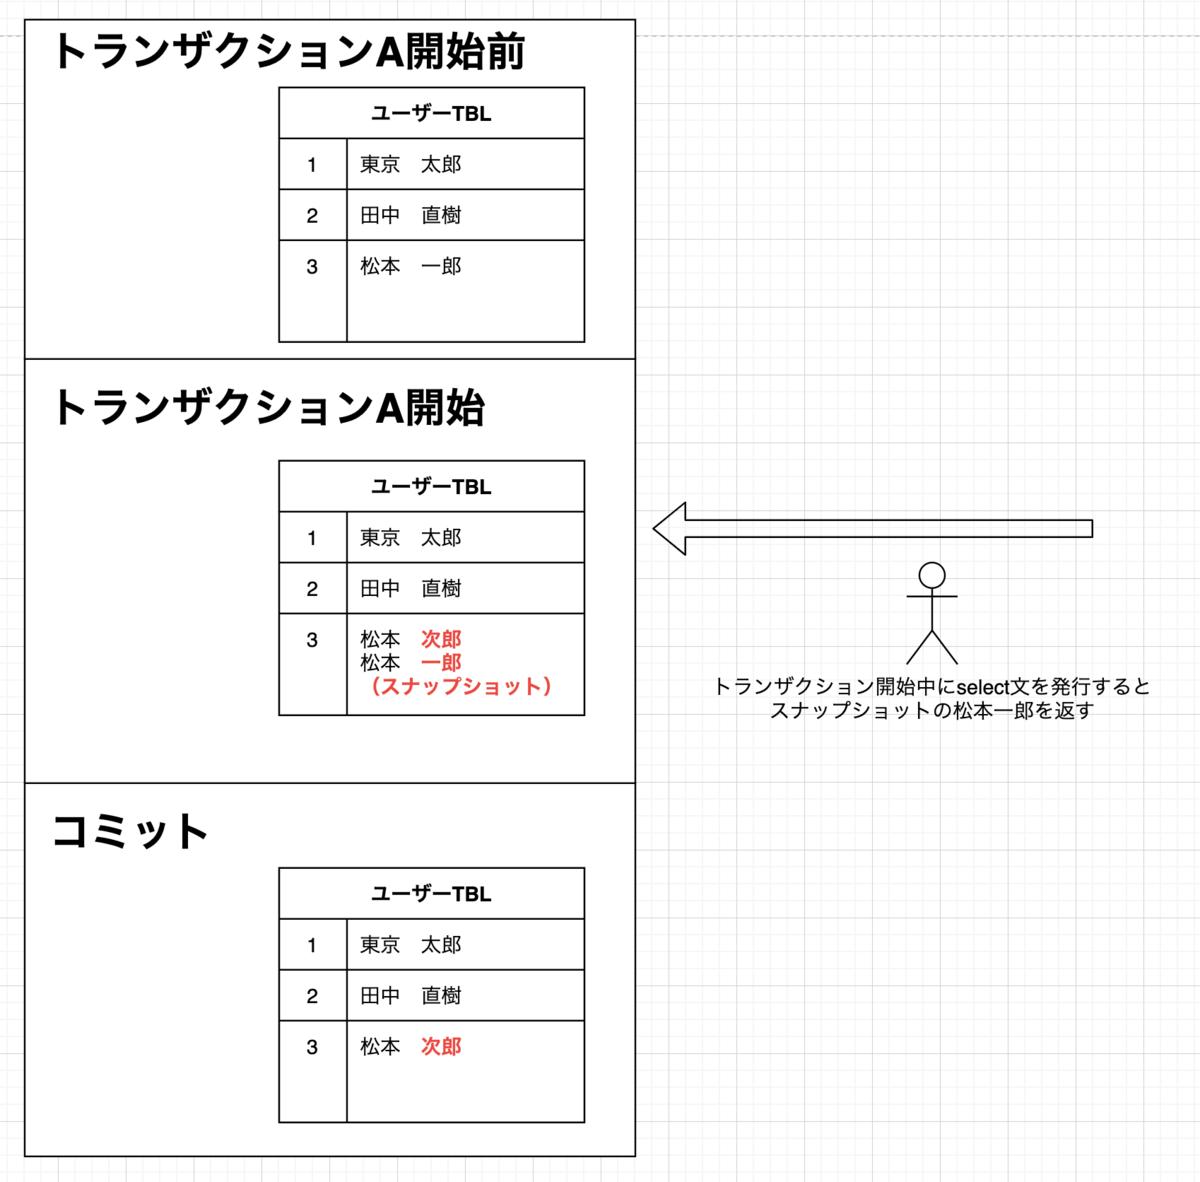 f:id:excite-naka-sho:20210513222744p:plain